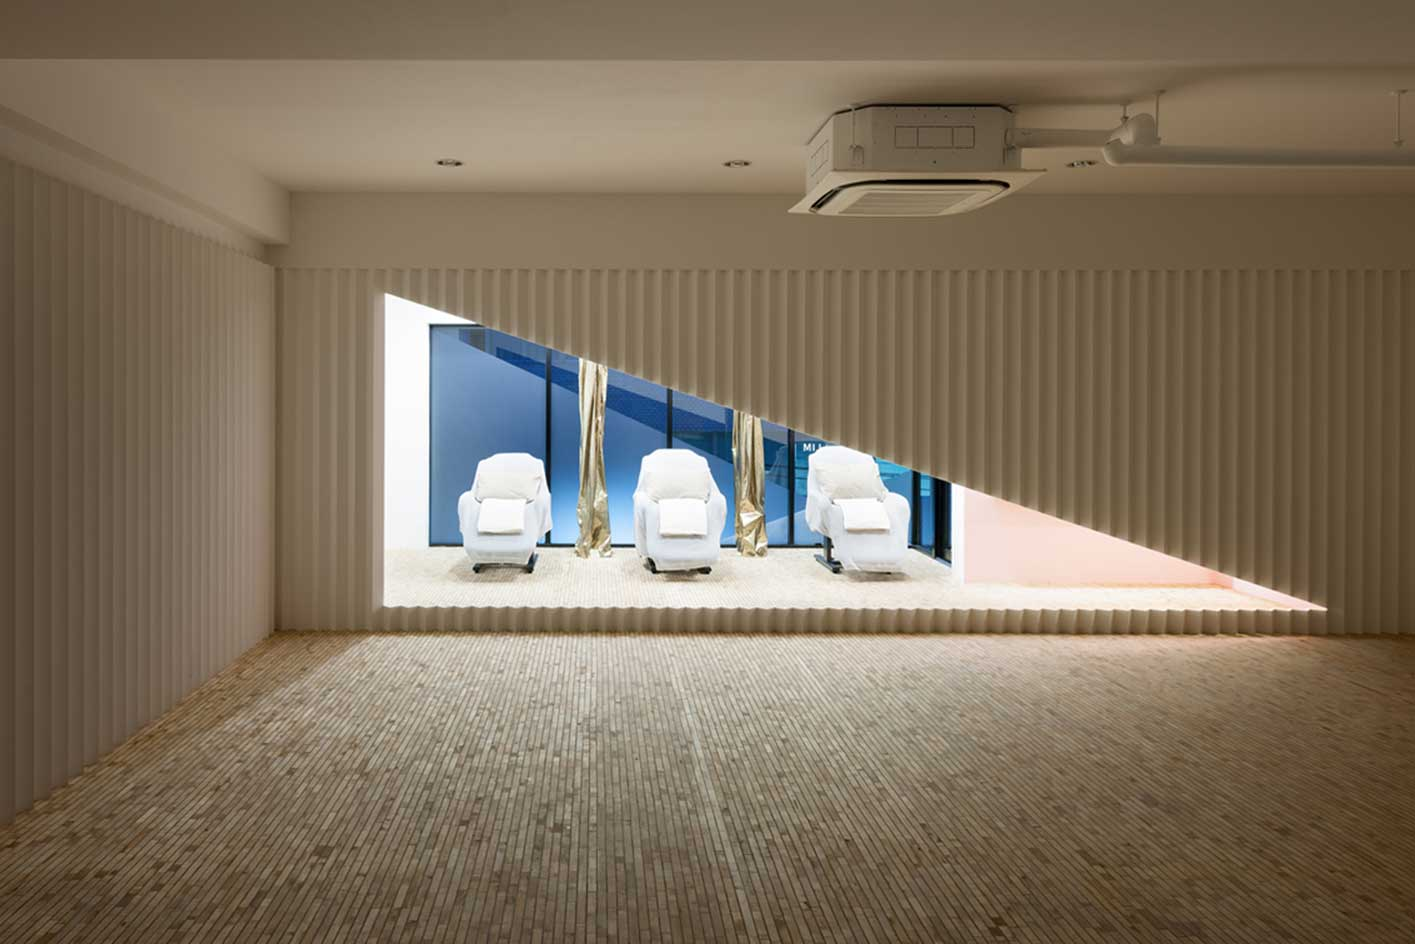 Kolmio+LIM by Yusuke Seki | Yellowtrace